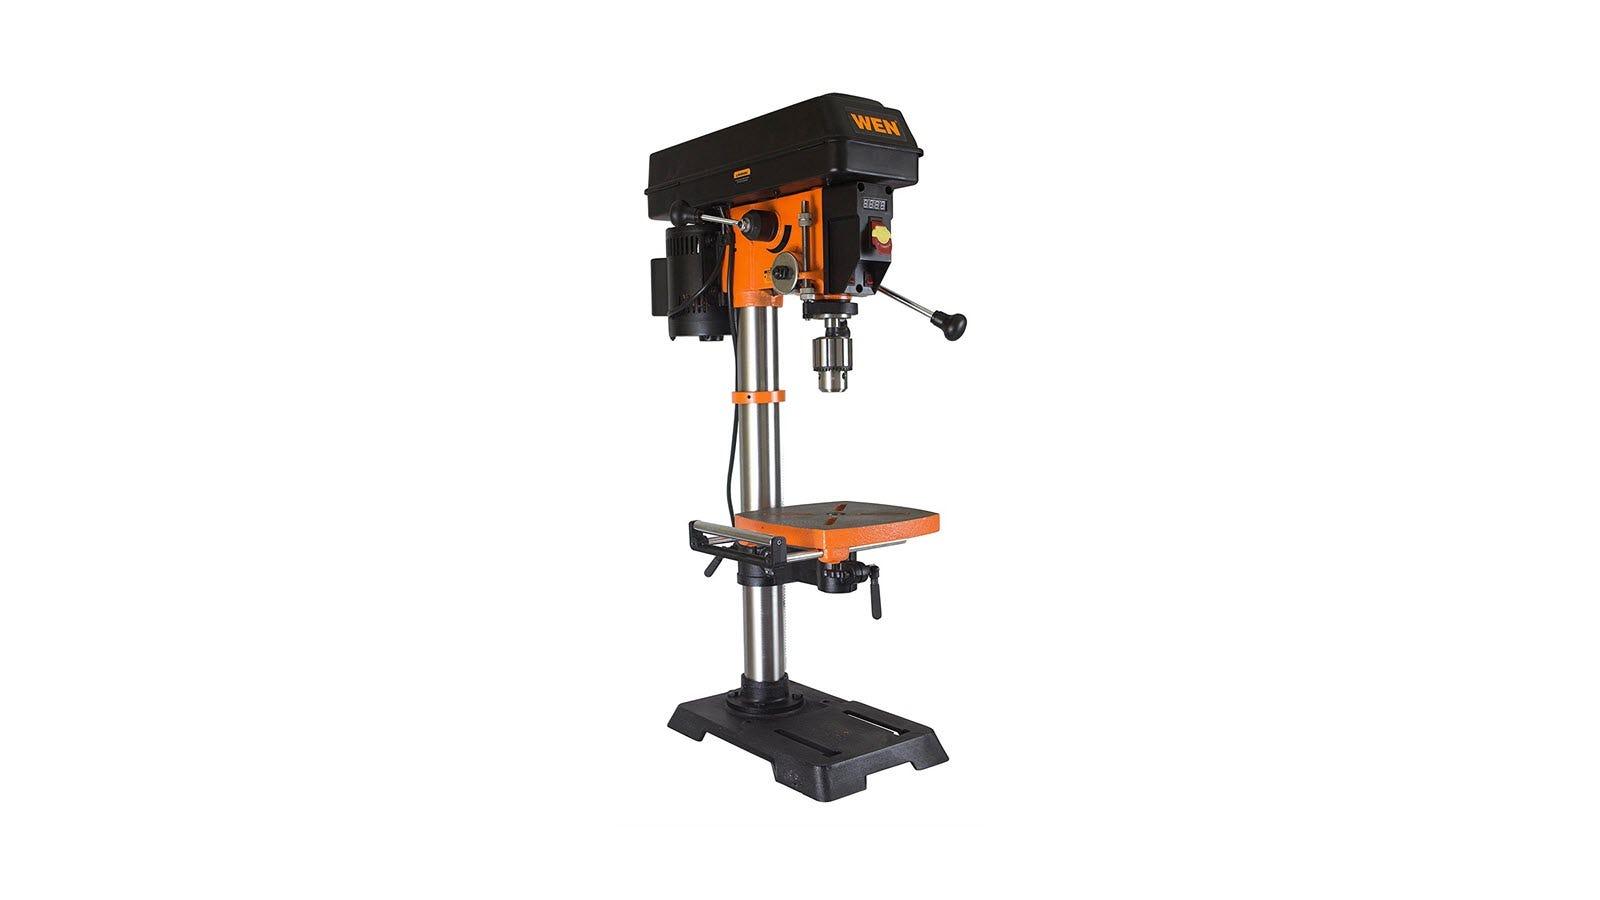 An orange and black WEN 4214 benchtop drill press.